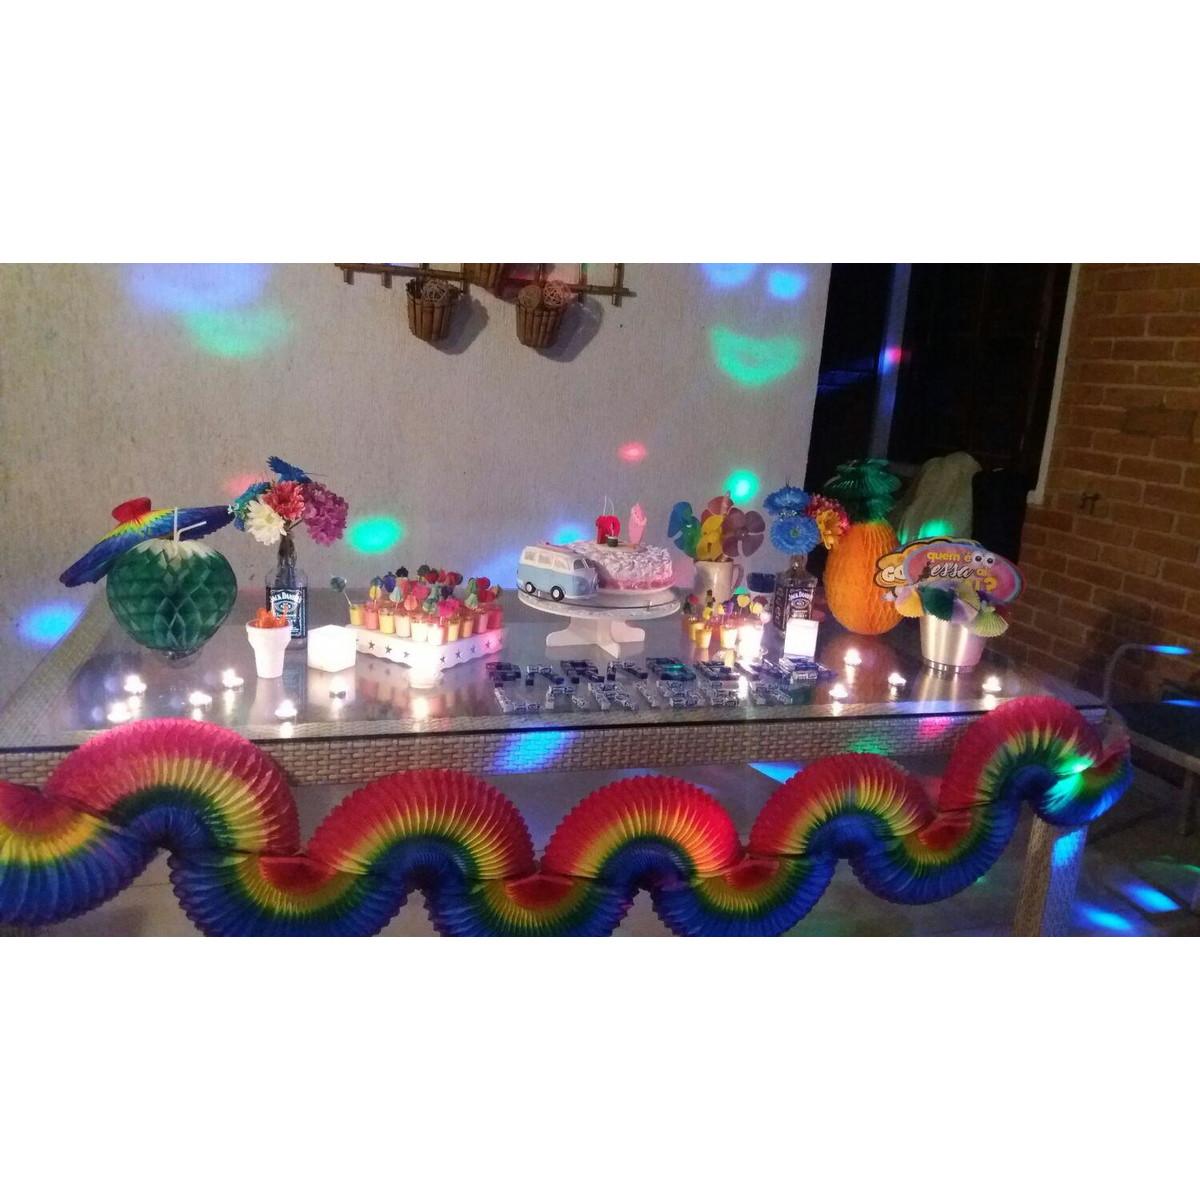 Kit Decoracao Festa Havaiana Dec Rapida No Elo7 Girotoy Enfeites